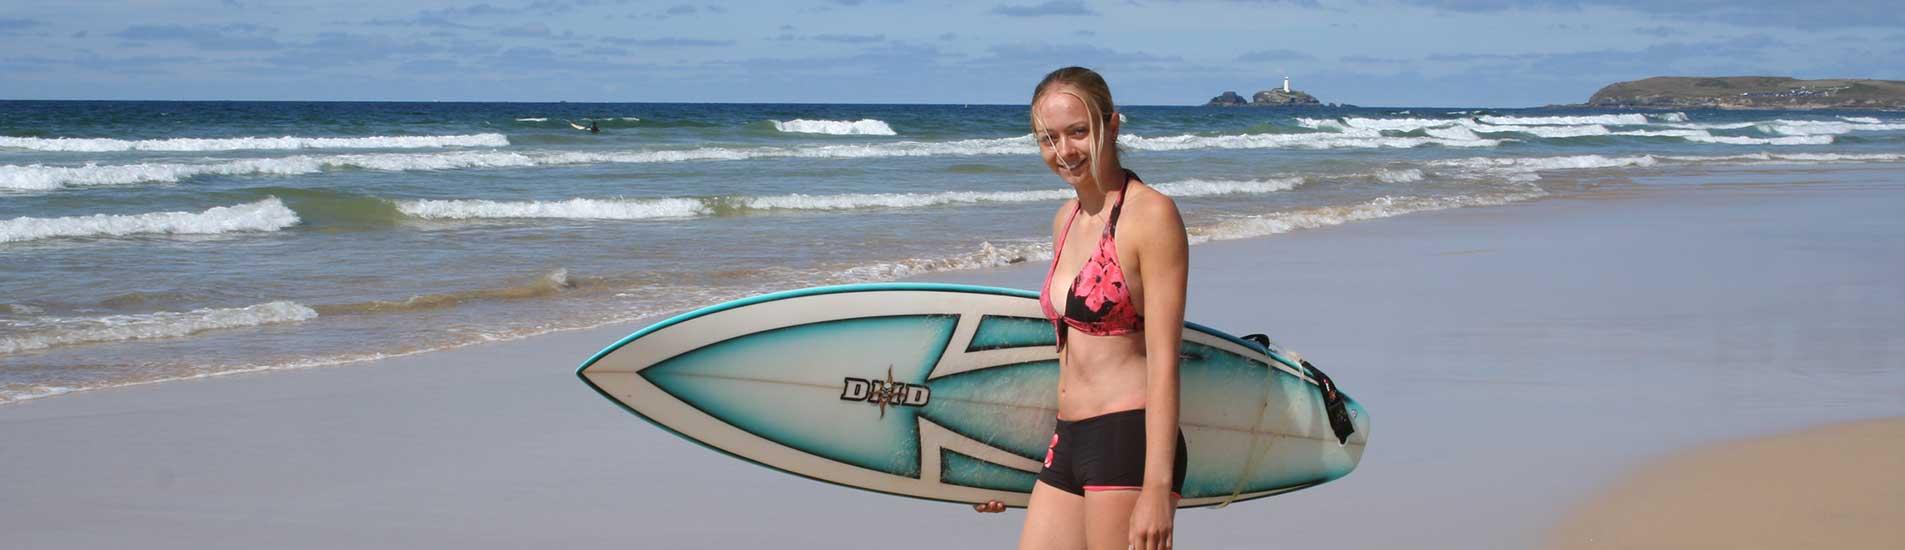 girl-surfing-st-ives